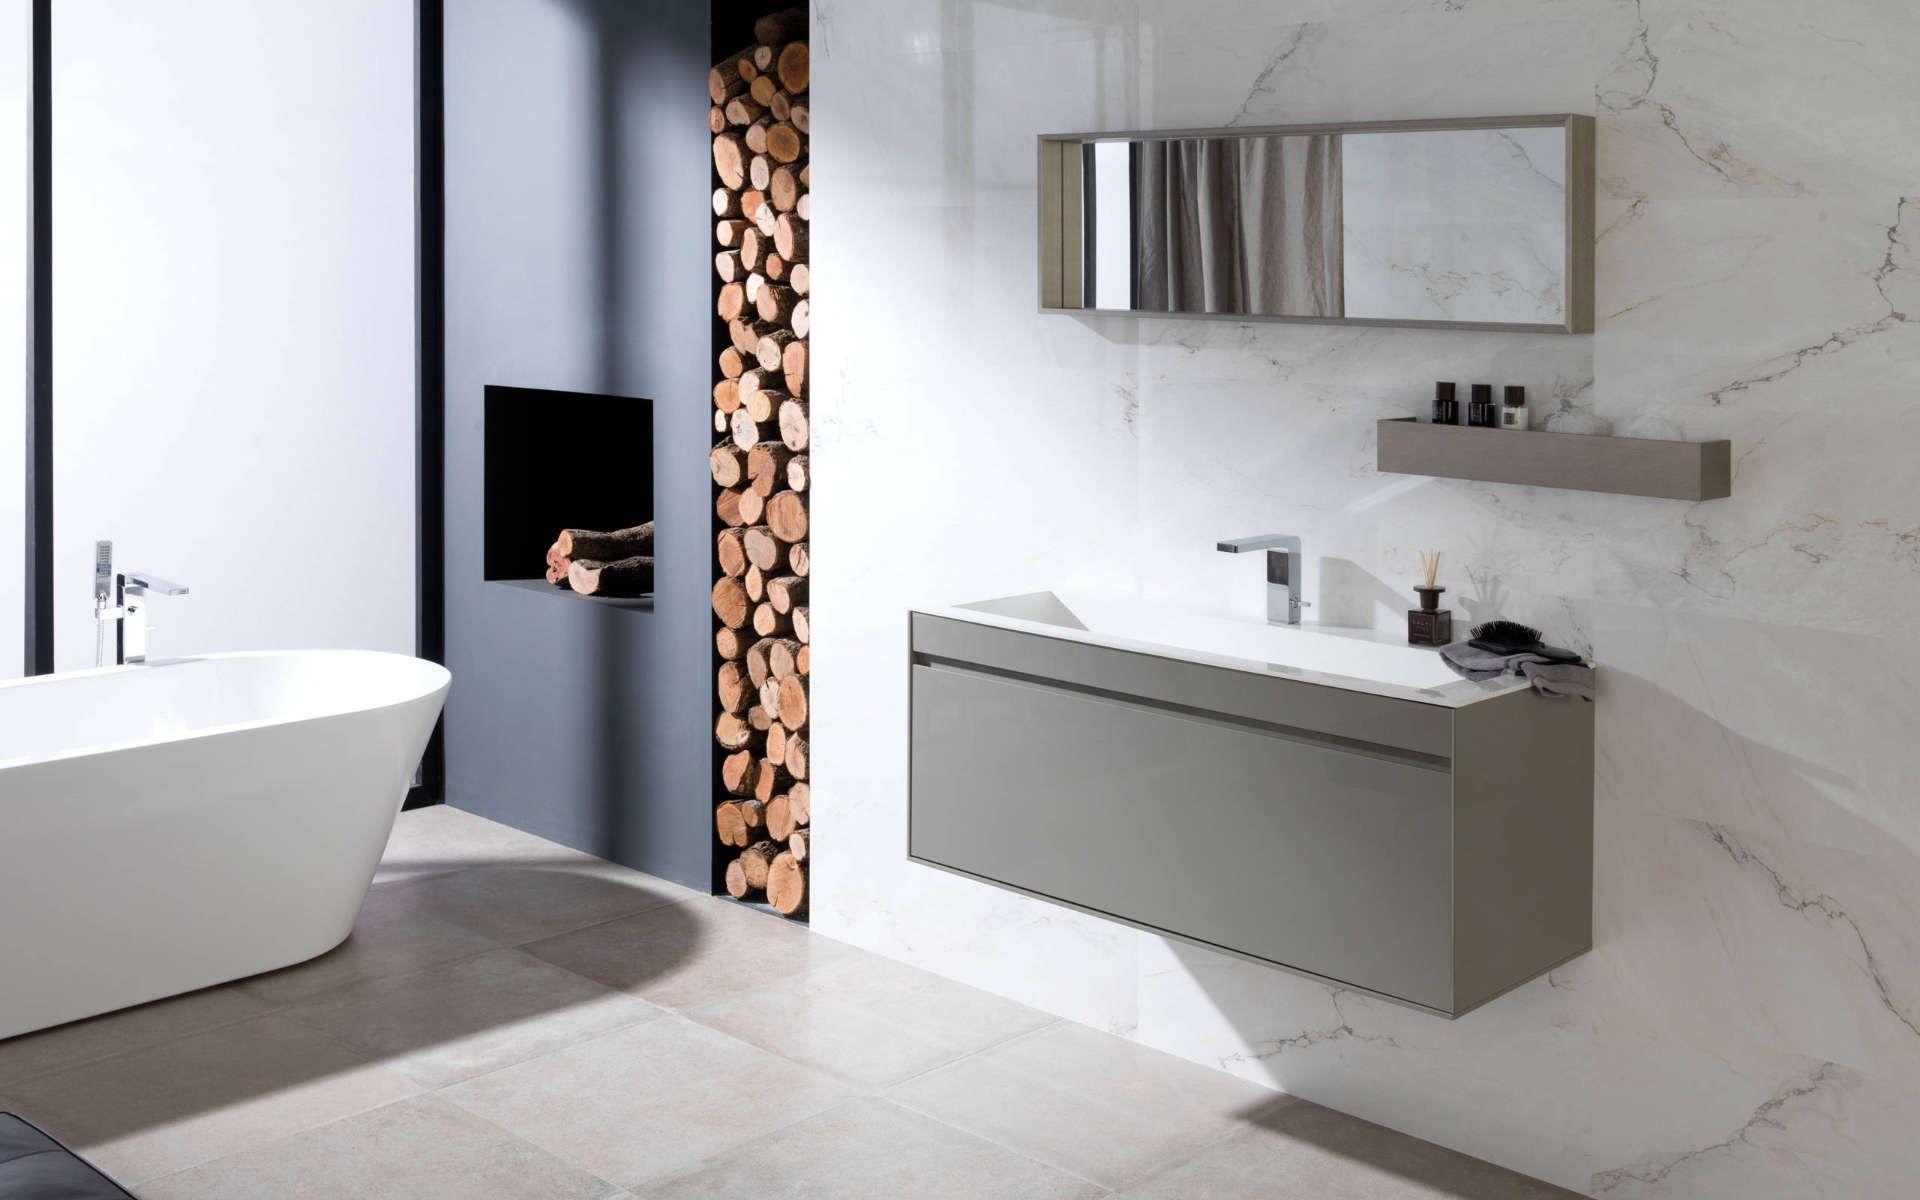 Bathroom Furniture Dess Limo Brillo Bathroom Furniture Modular Bathrooms Small Bathroom Vanities